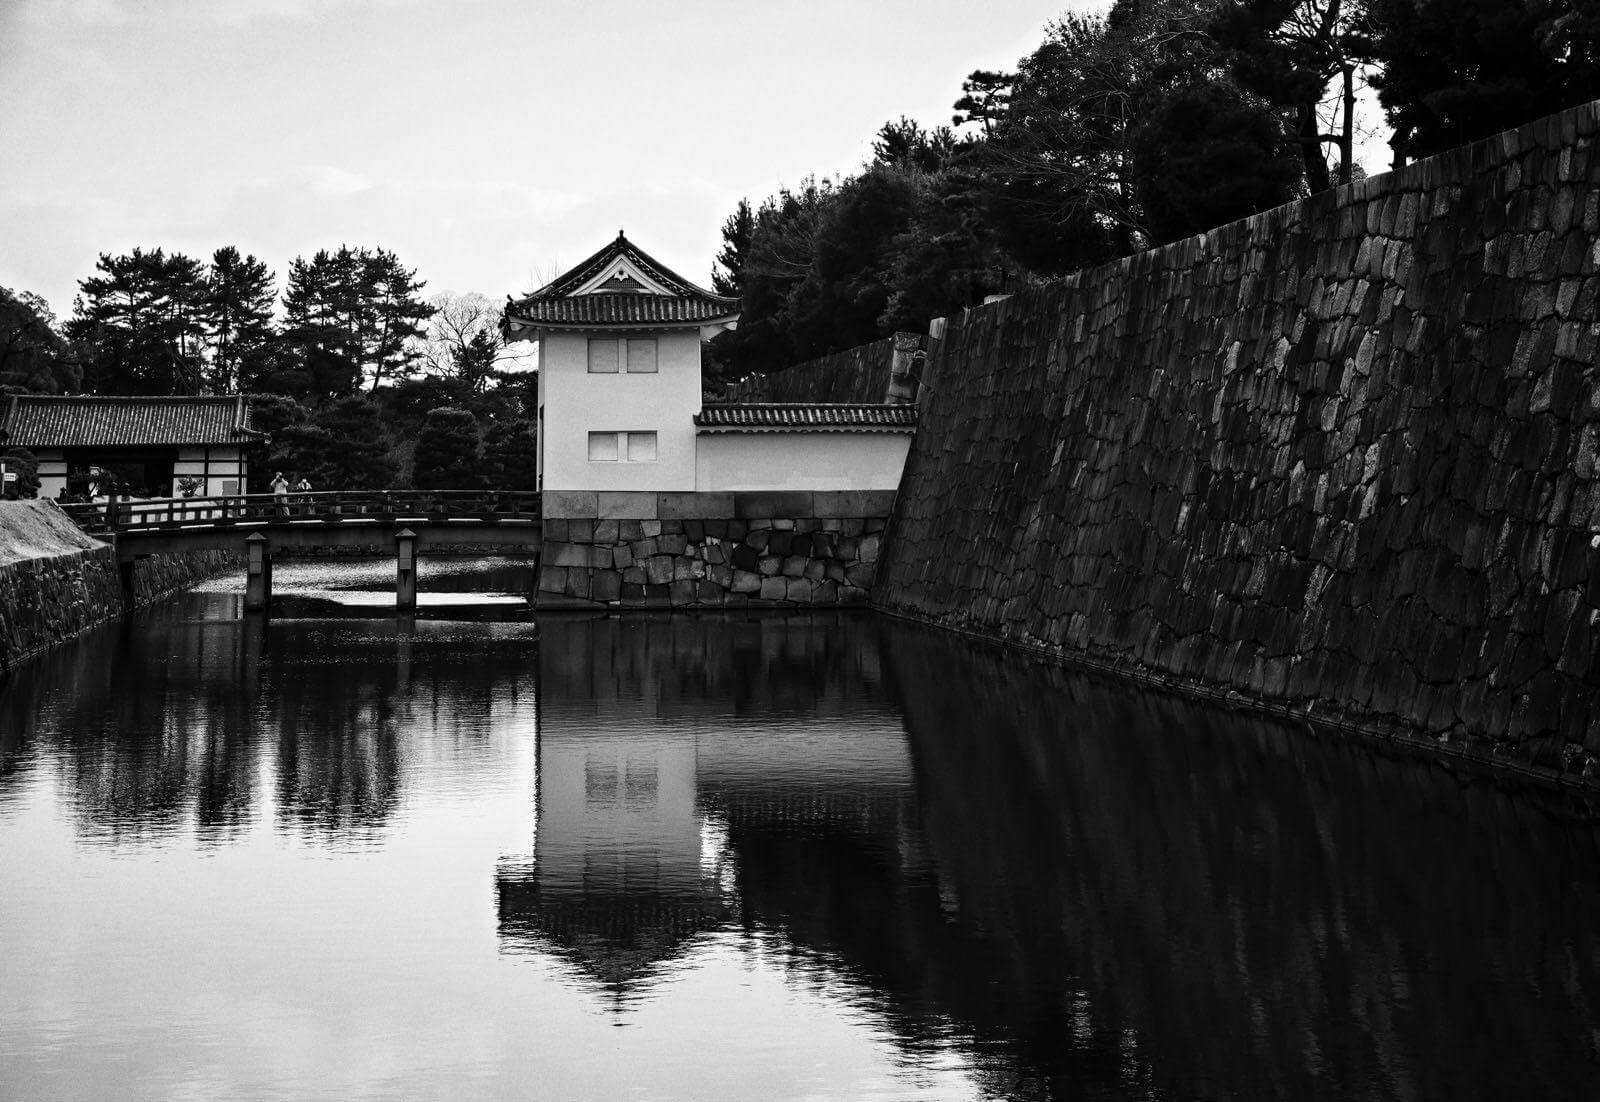 Nijō Castle, Kyoto, Japan - Photo by Zdenek Sindelar of CuriousZed Photography